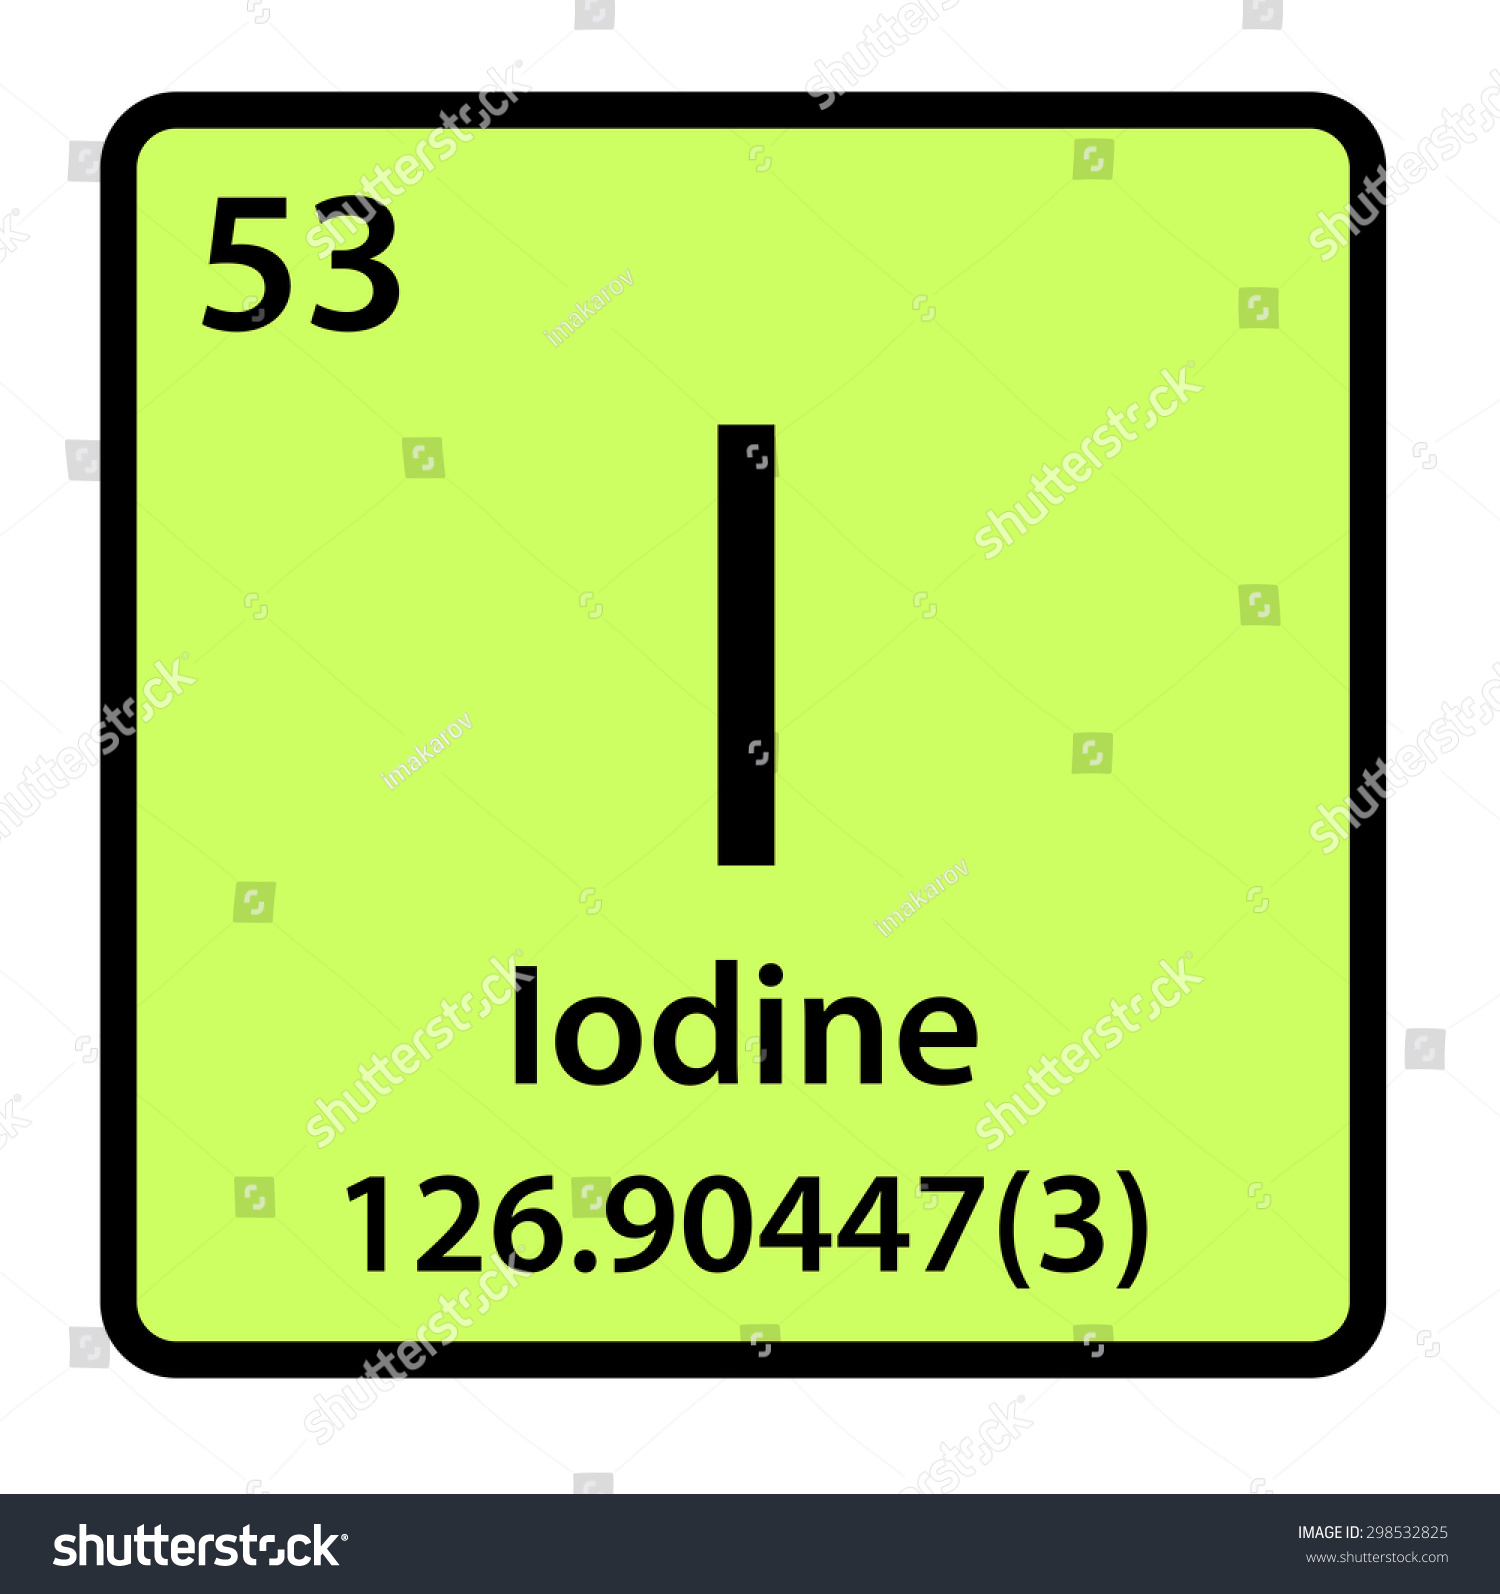 Element iodine periodic table stock illustration 298532825 element iodine of the periodic table gamestrikefo Choice Image